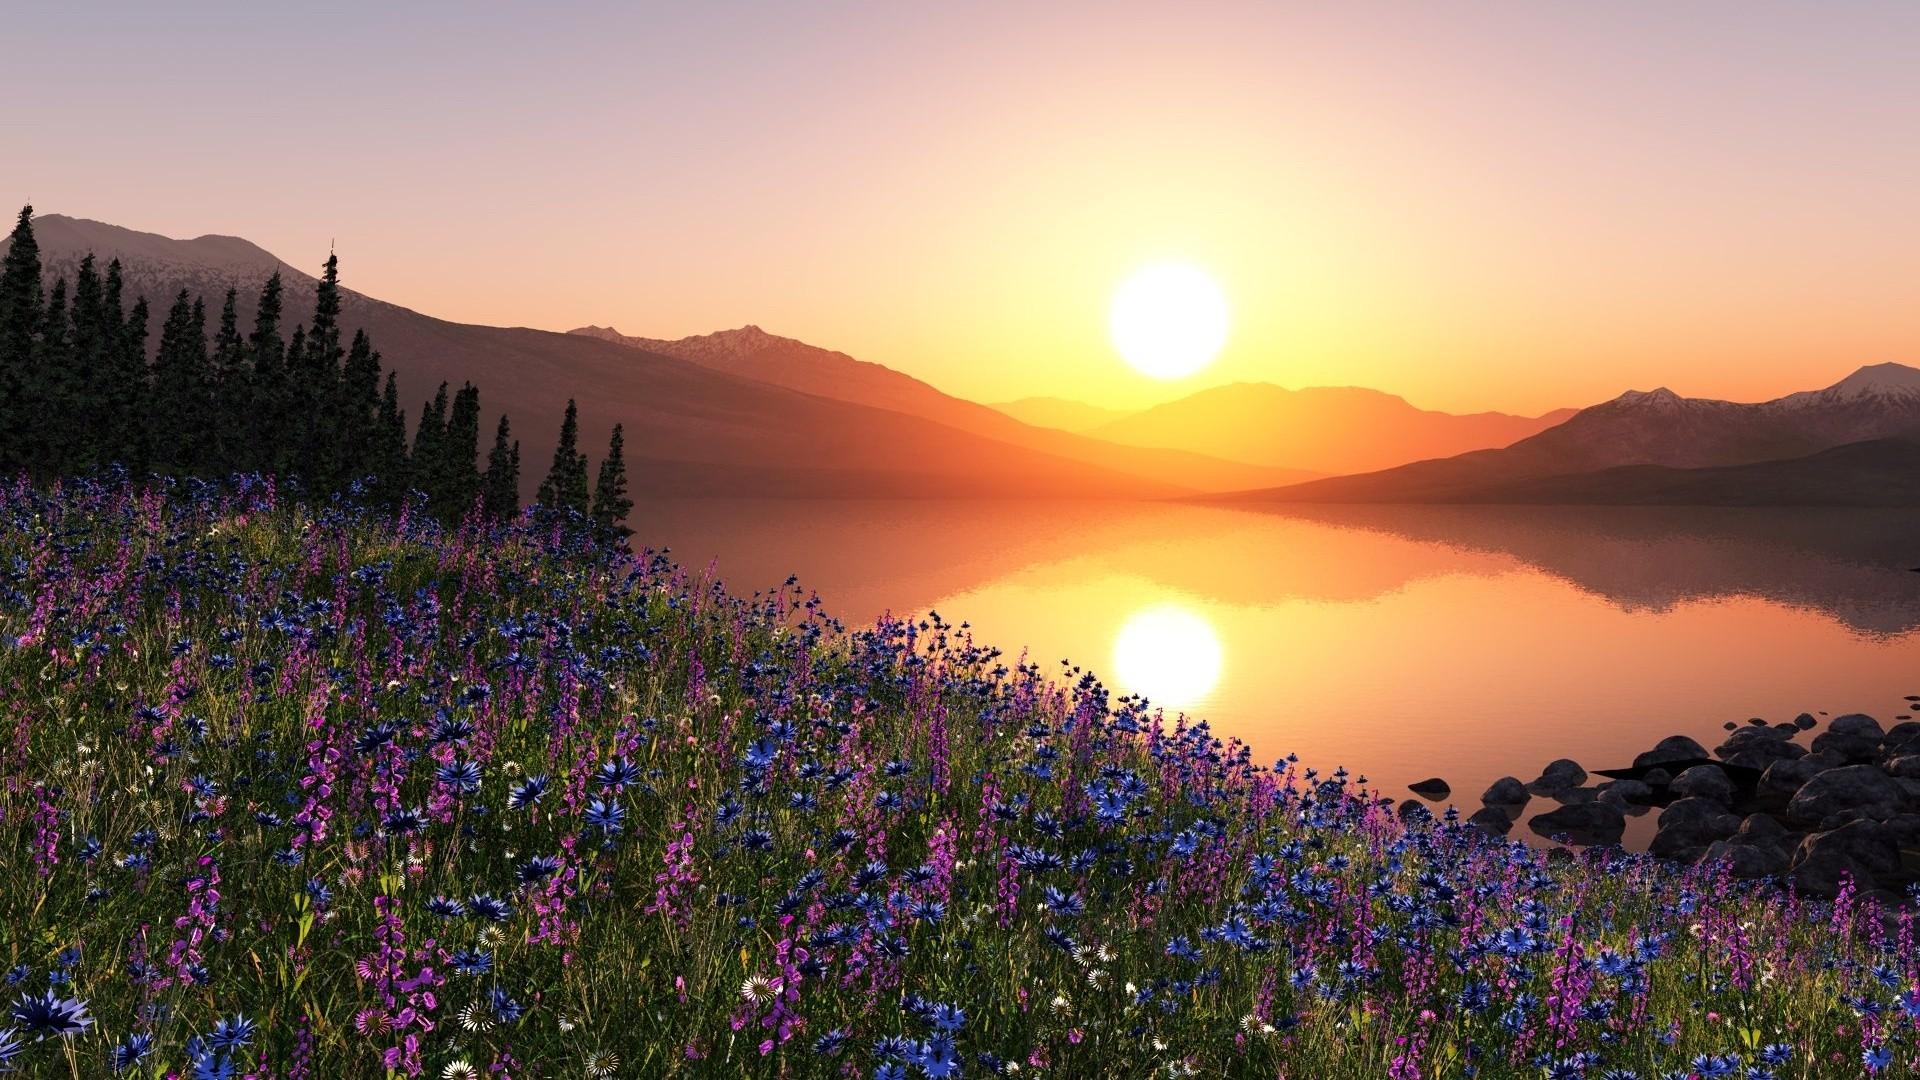 Scenic Sunset Image